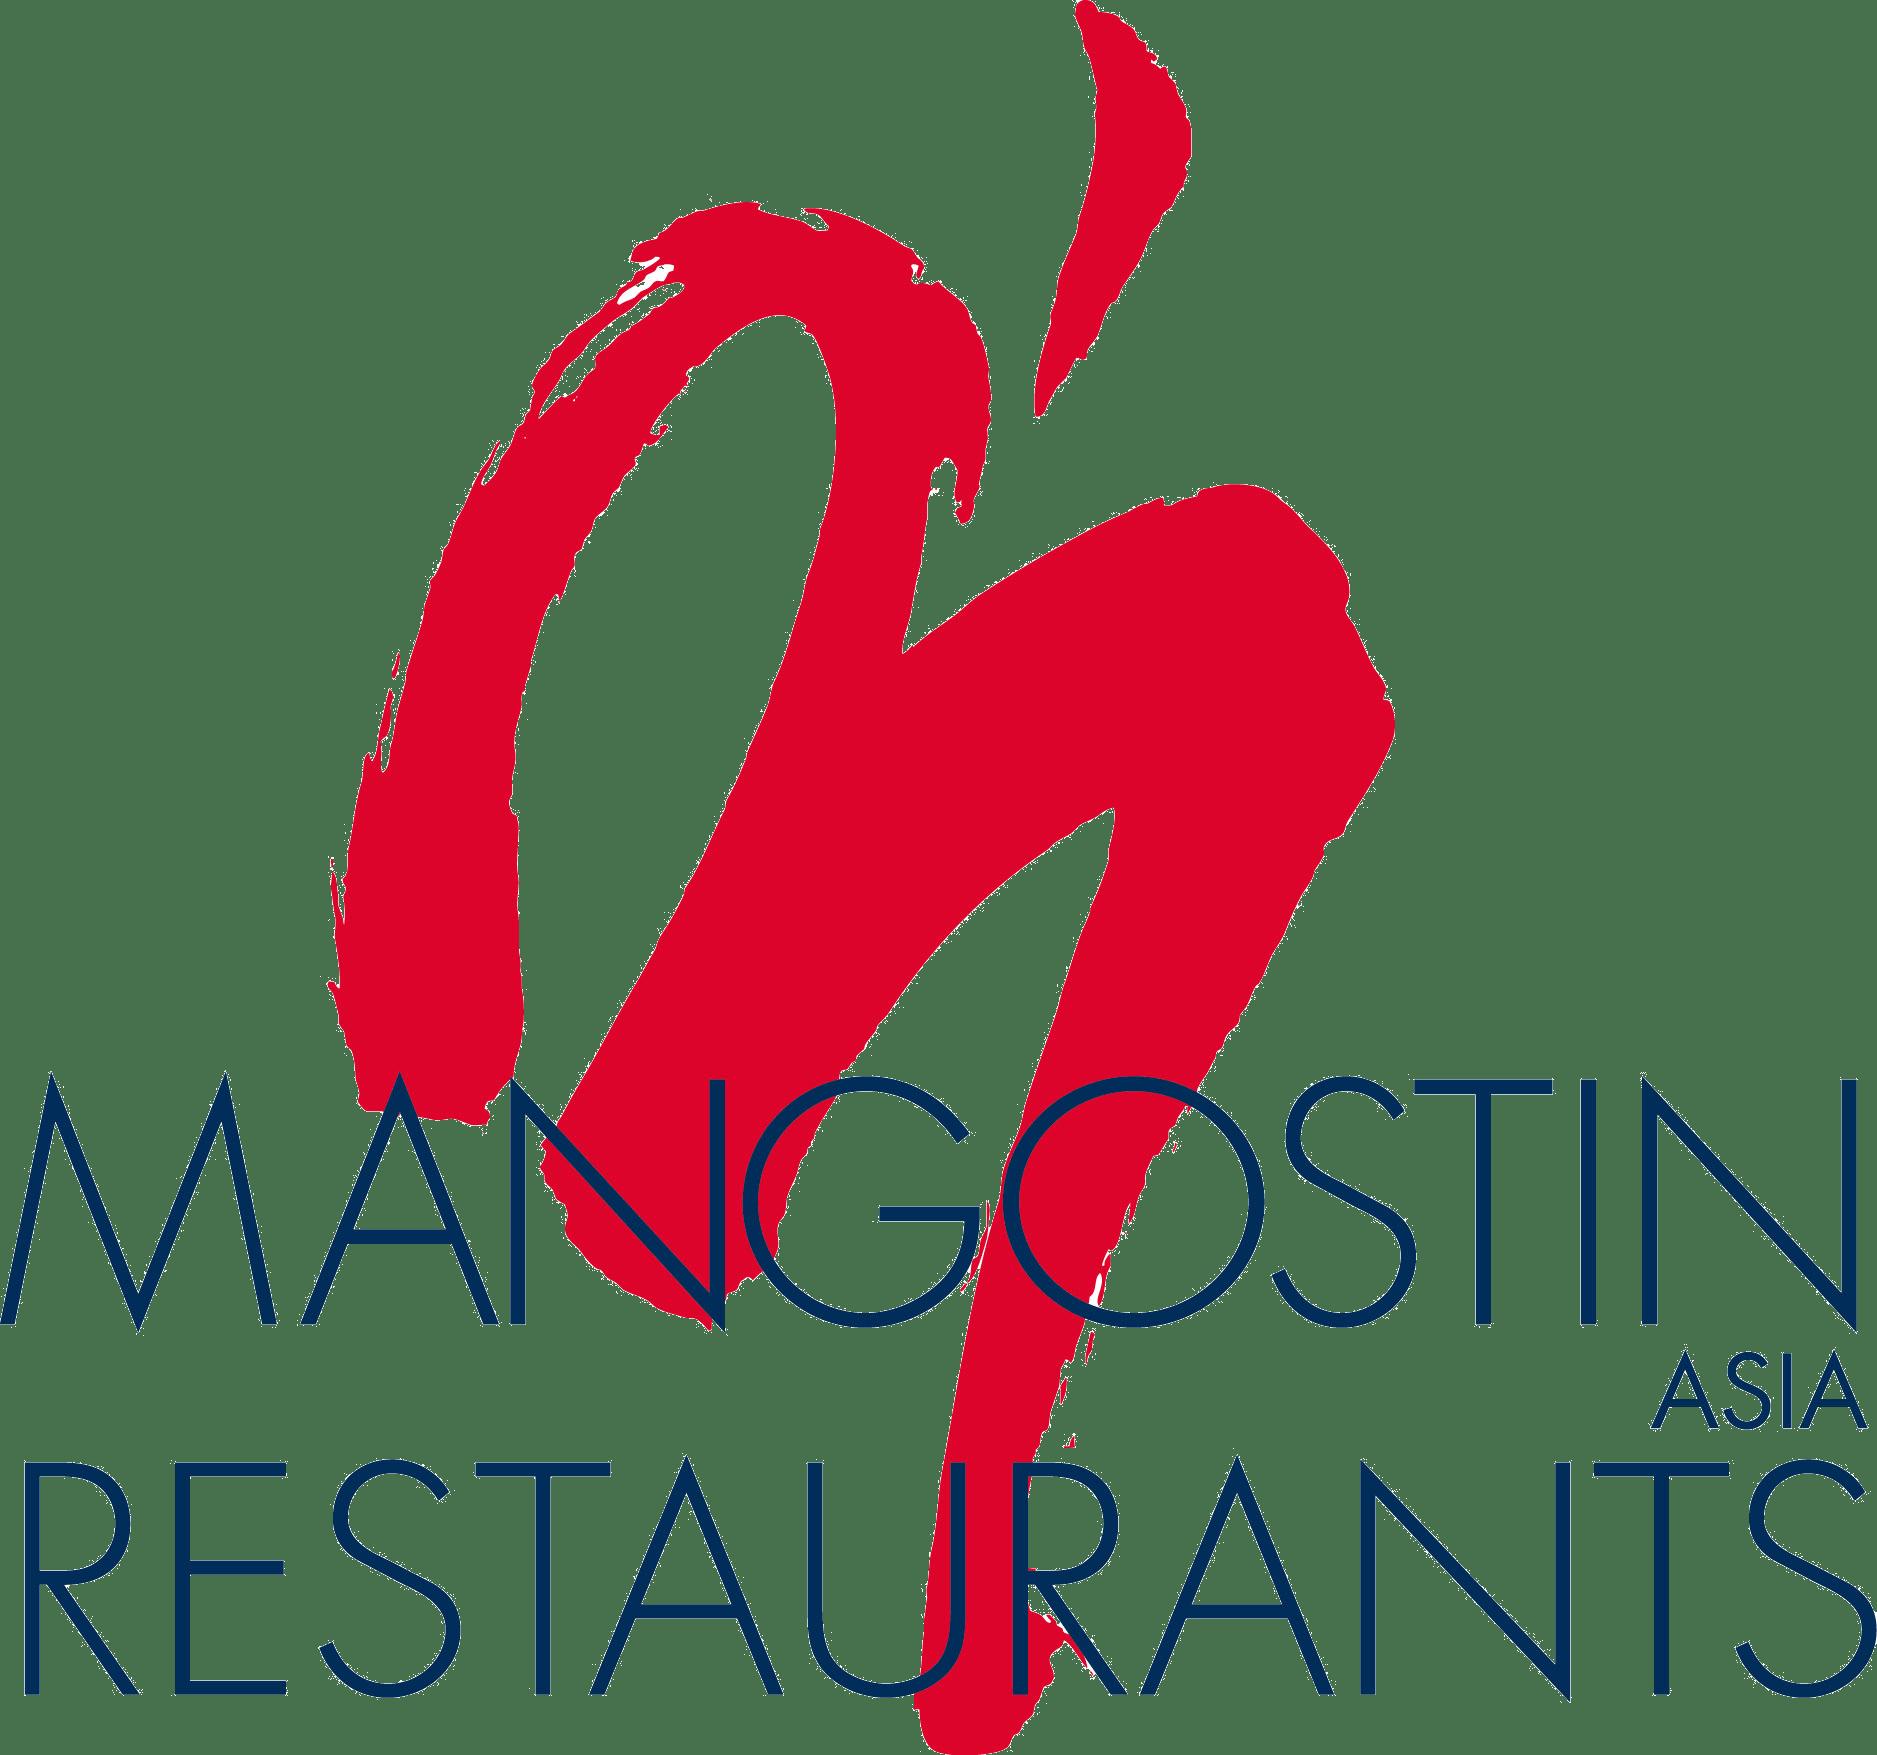 Mangostin